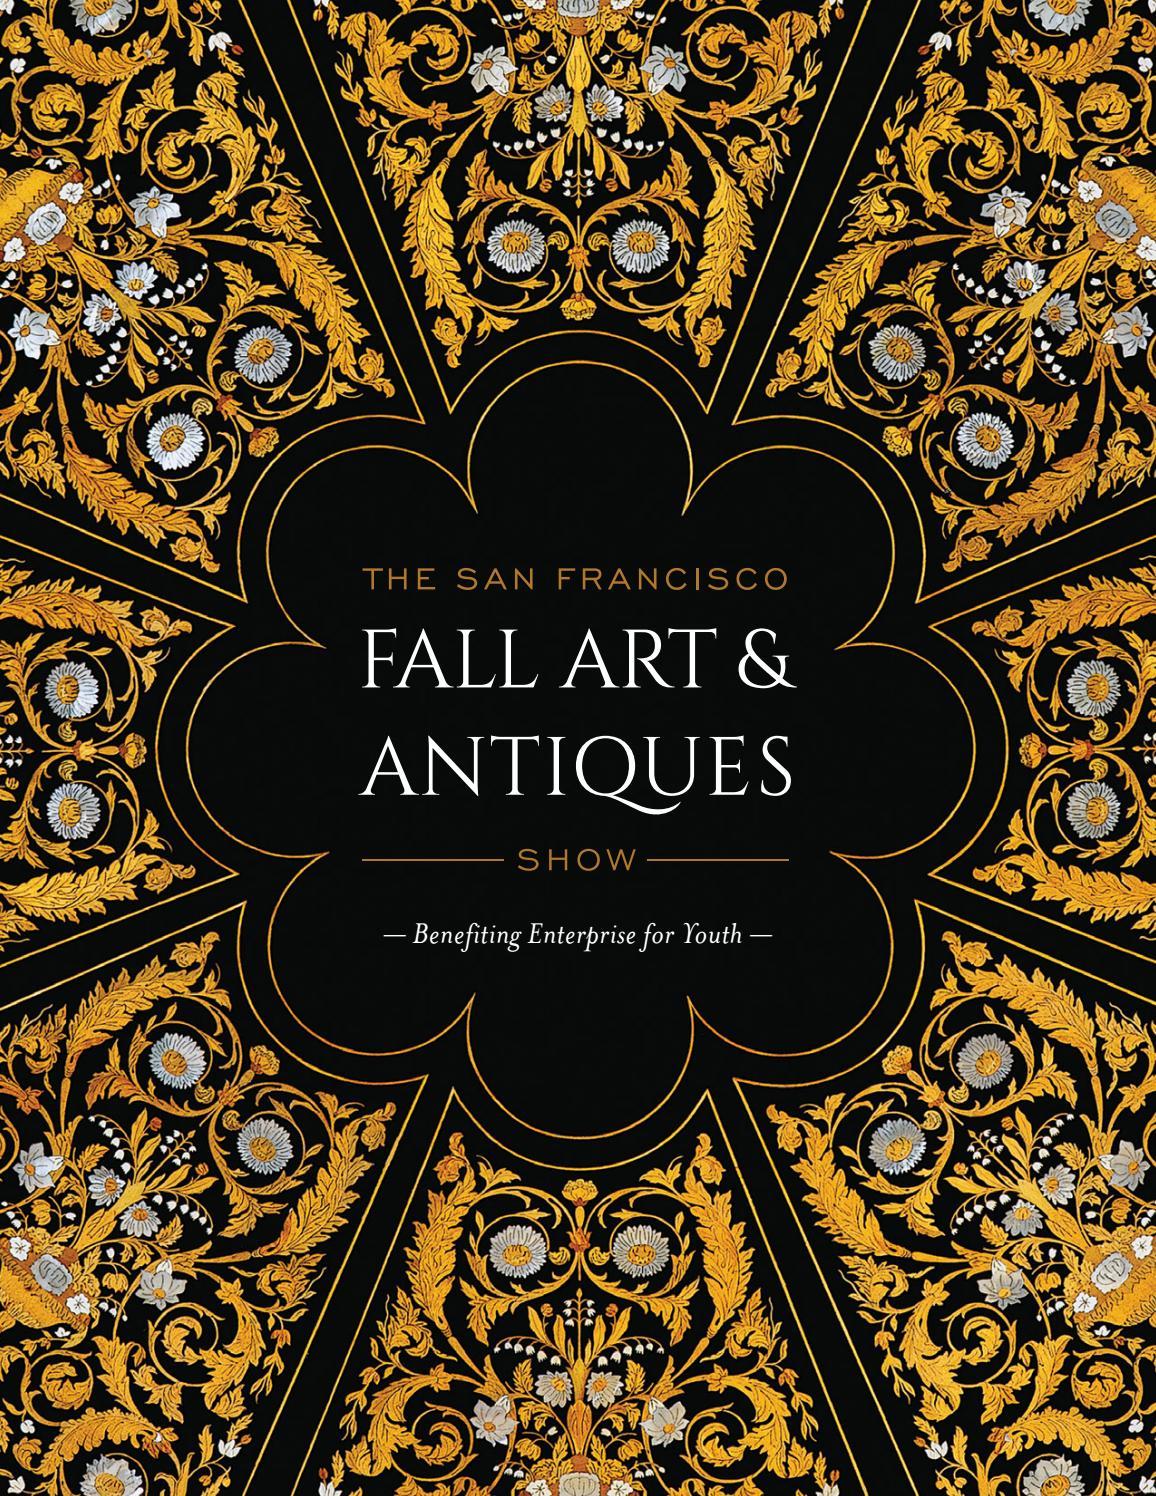 The 2017 San Francisco Fall Art Antiques Show Catalogue By Speaker Diablo Vx 603 Dw Issuu